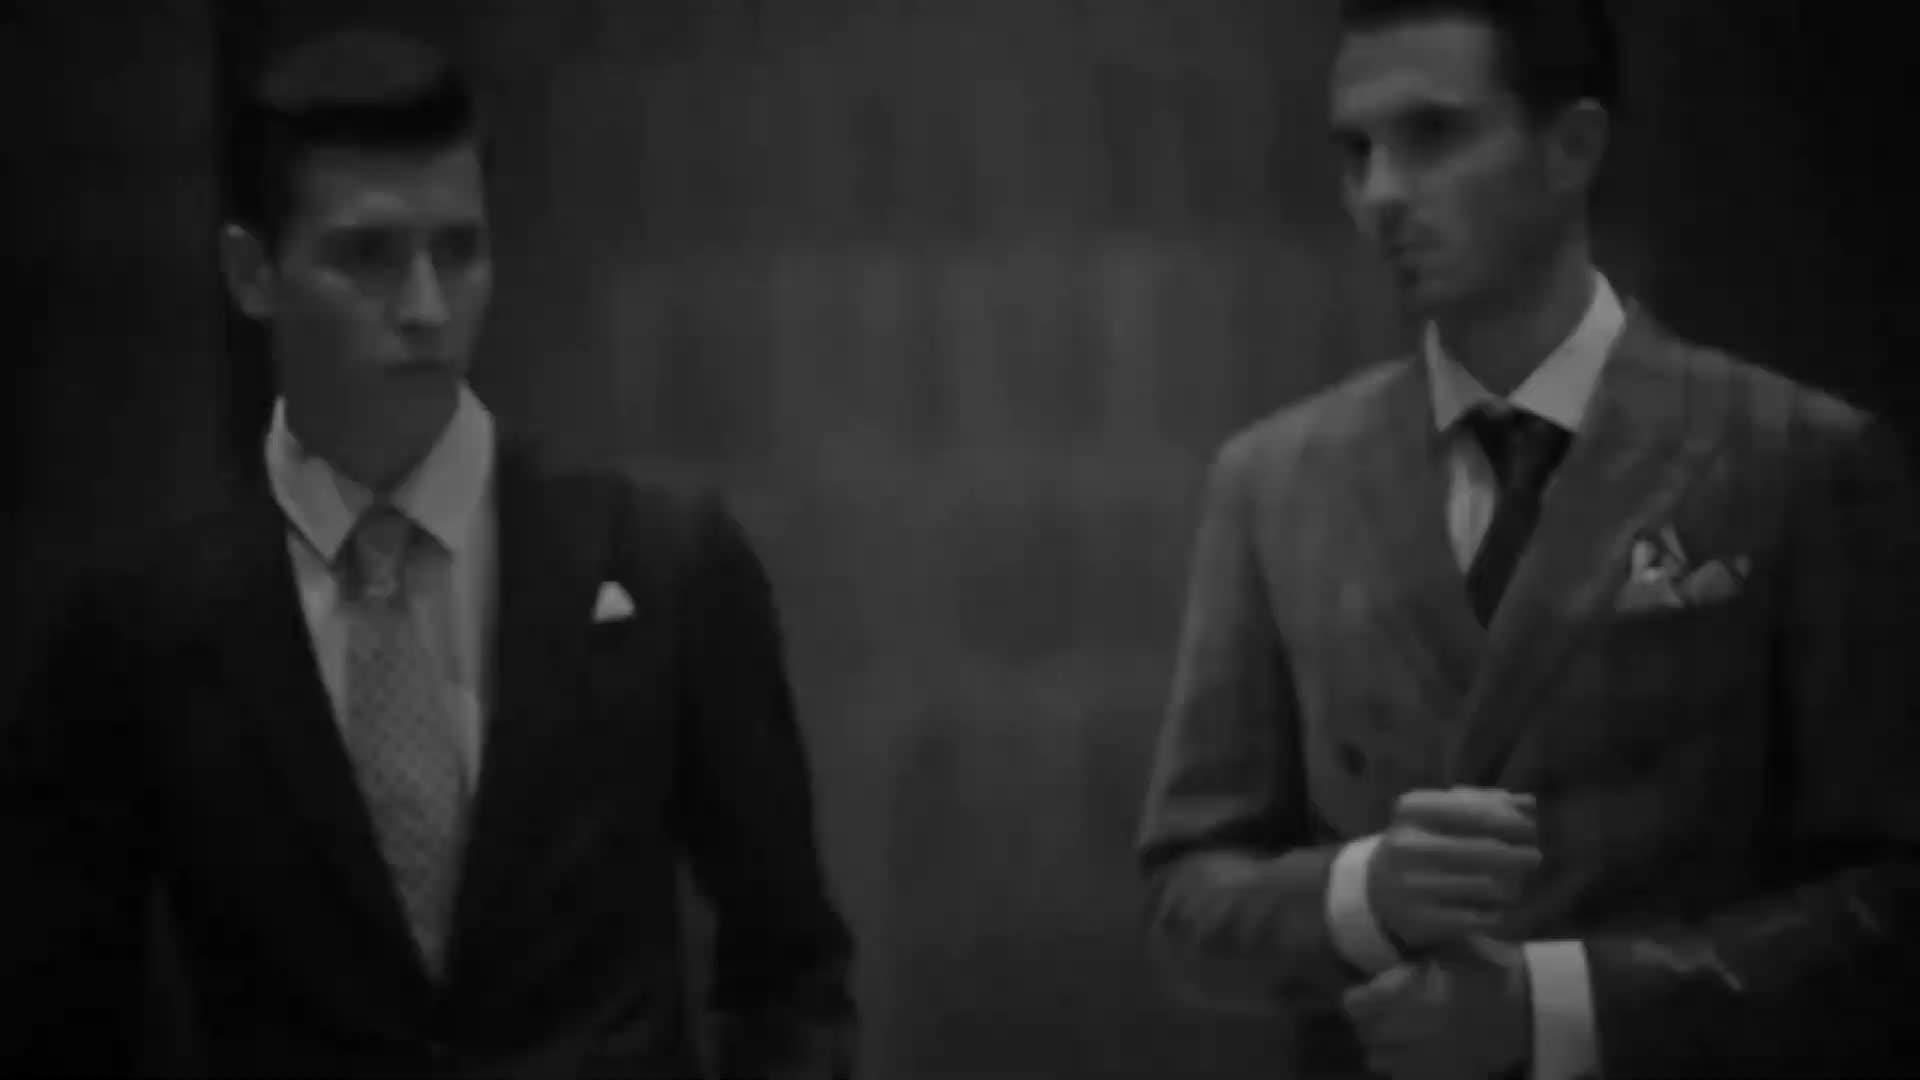 Homens de luxo Cinza Rosa Floral 8cm Largura Tie Hanky Abotoaduras Define homens Pescoço Laços de Seda para homens